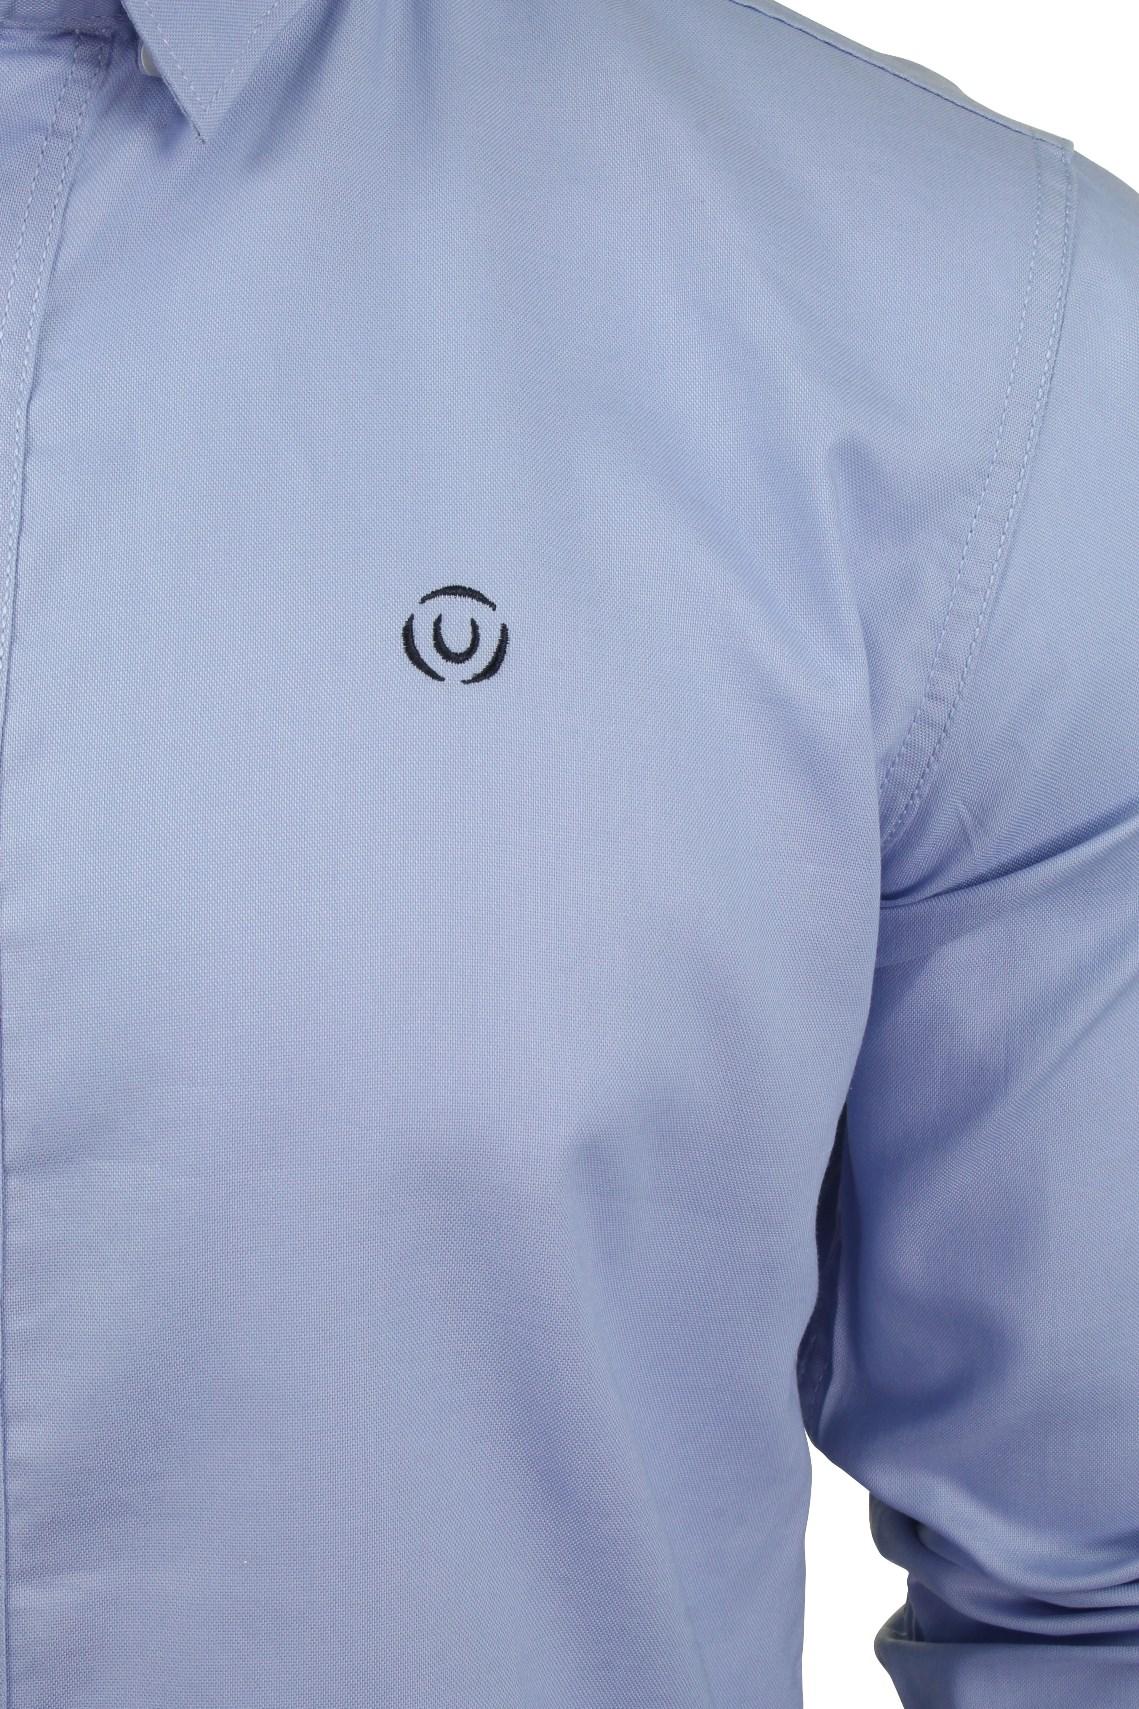 Para-hombres-camisa-de-manga-larga-por-Pato-Y-Cubierta-039-abedul-039 miniatura 10